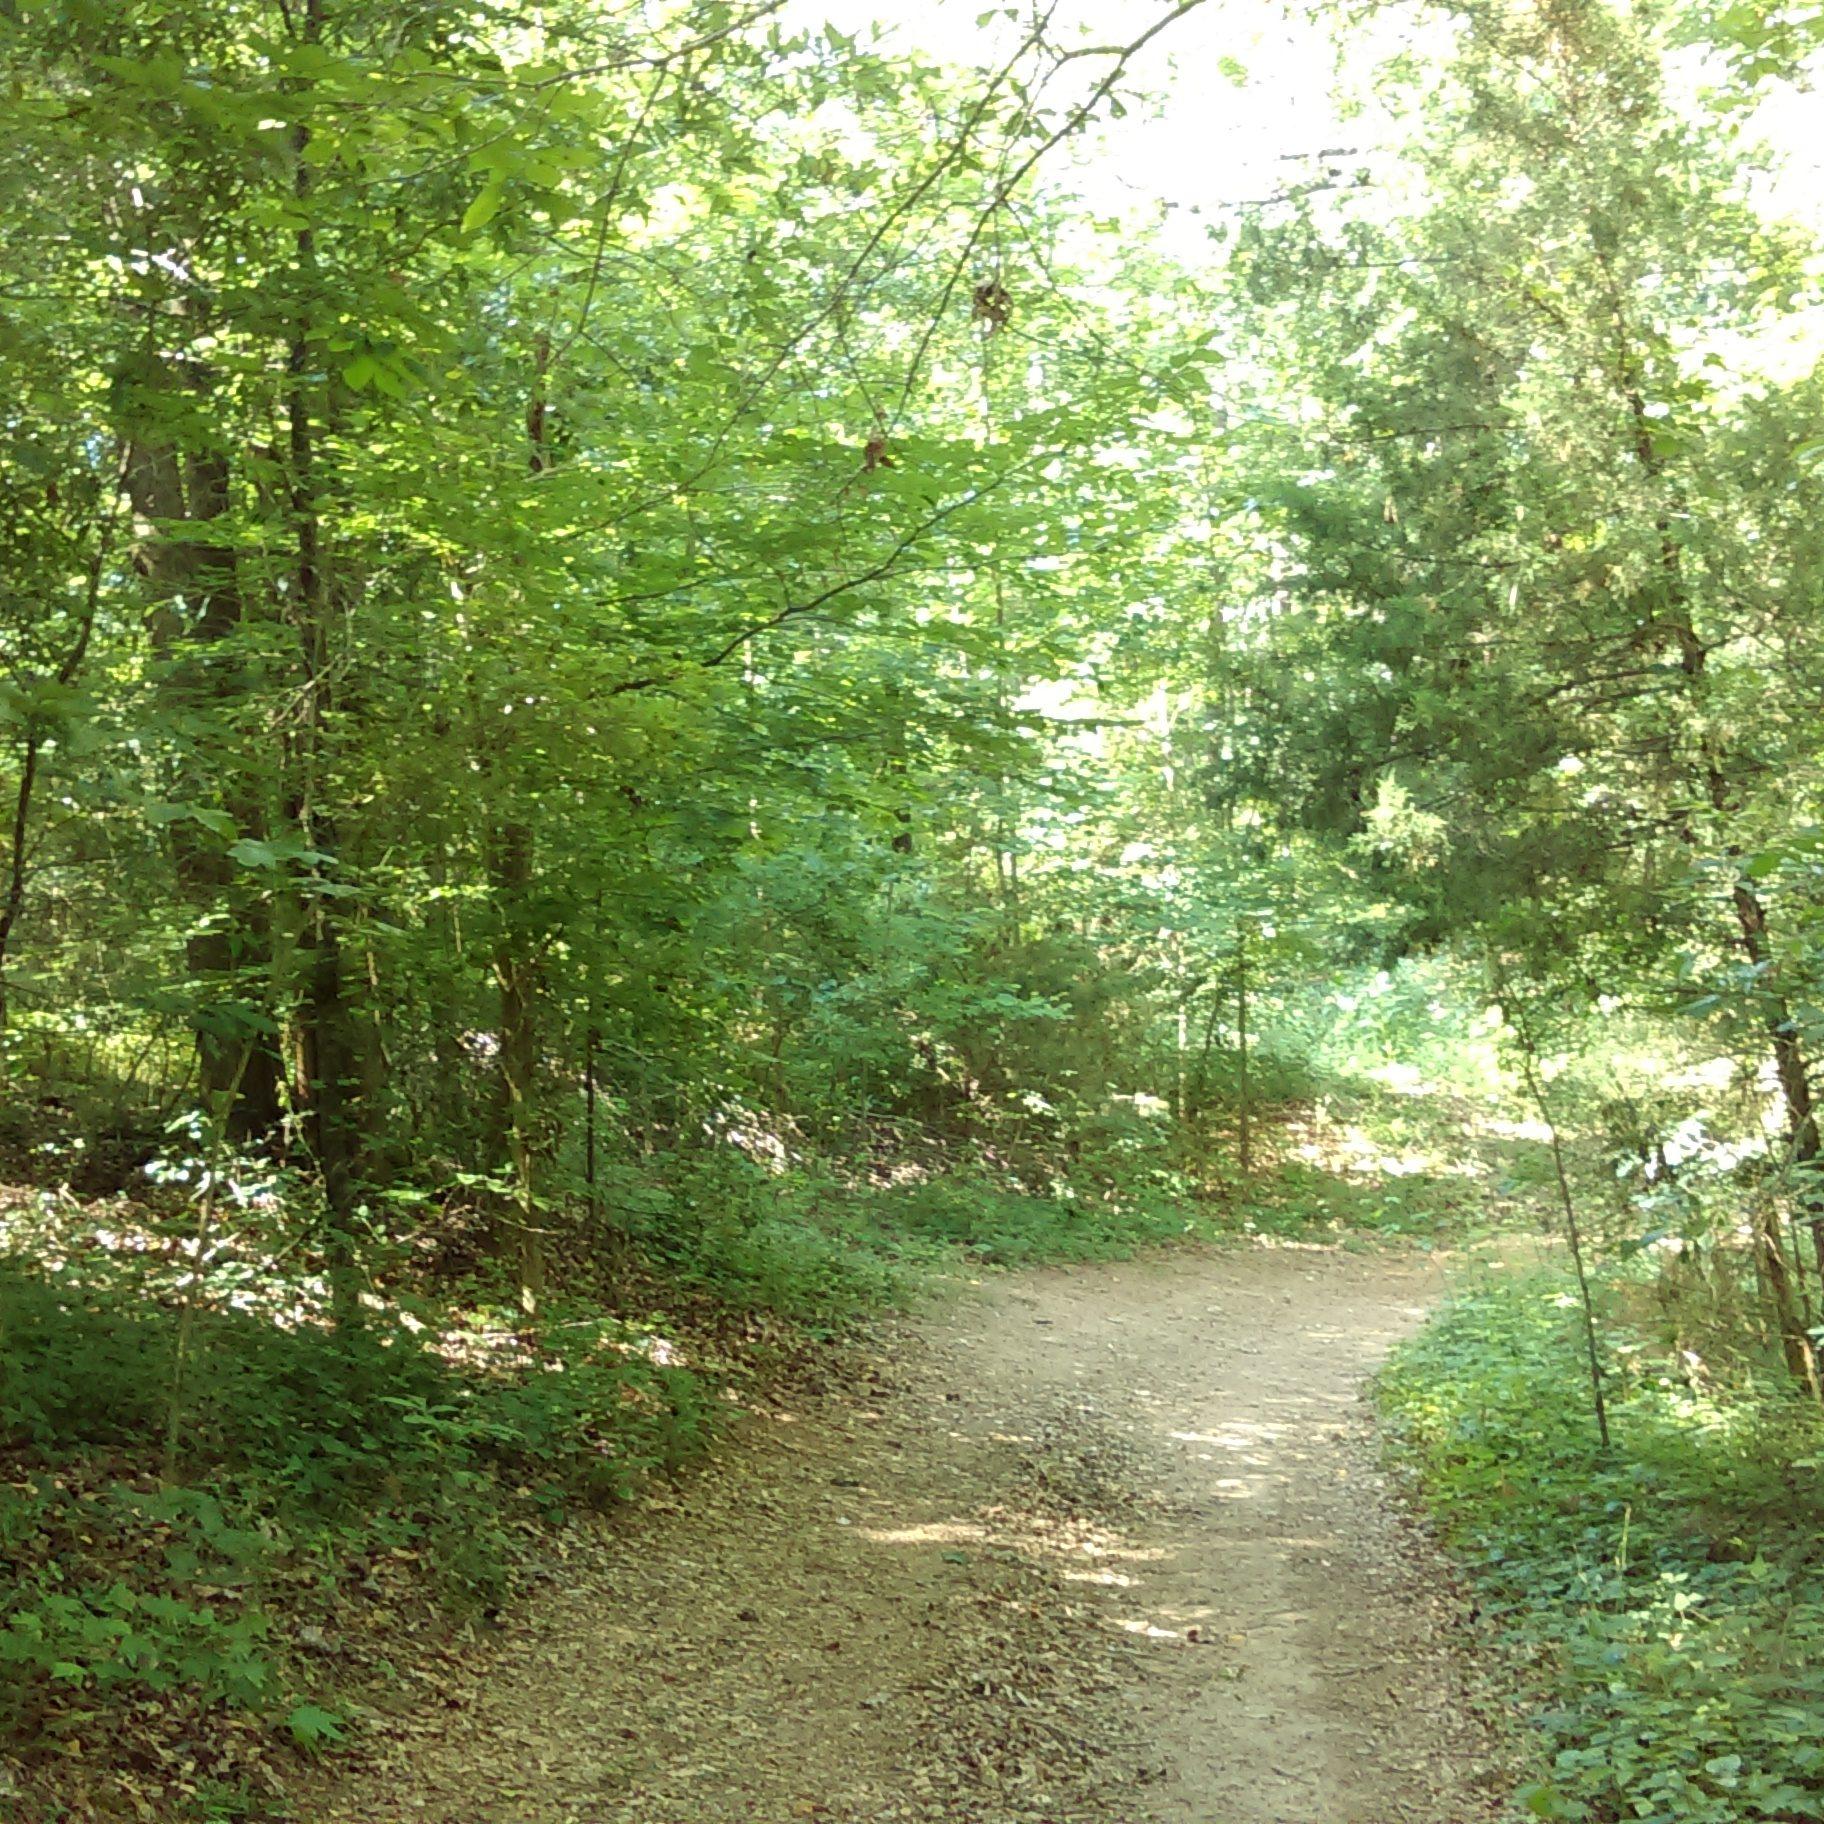 4.5 miles walking trails